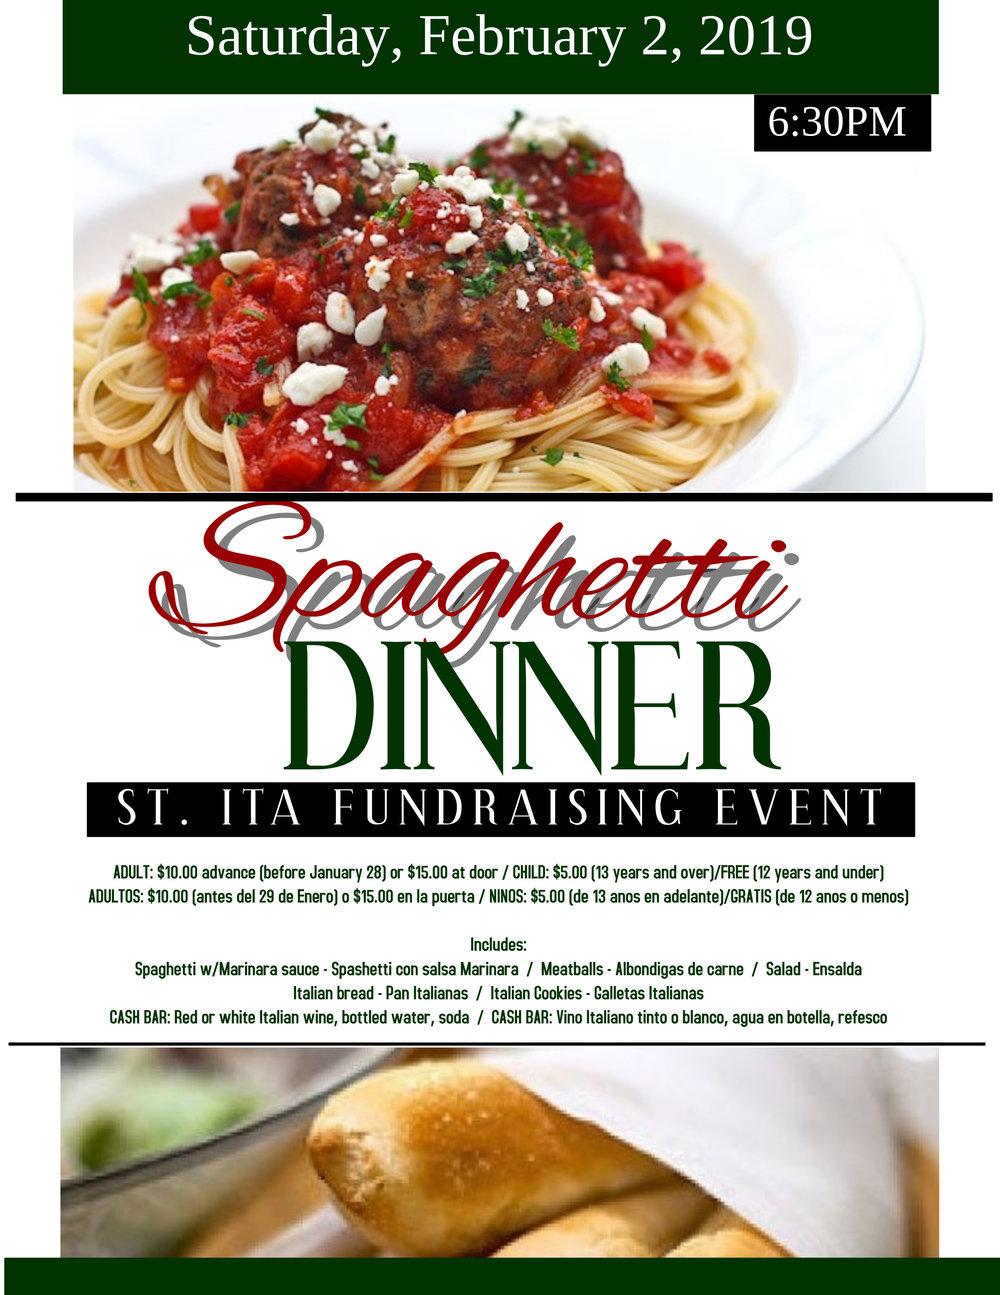 85x11 - 2019-Spaghetti Dinner.jpg